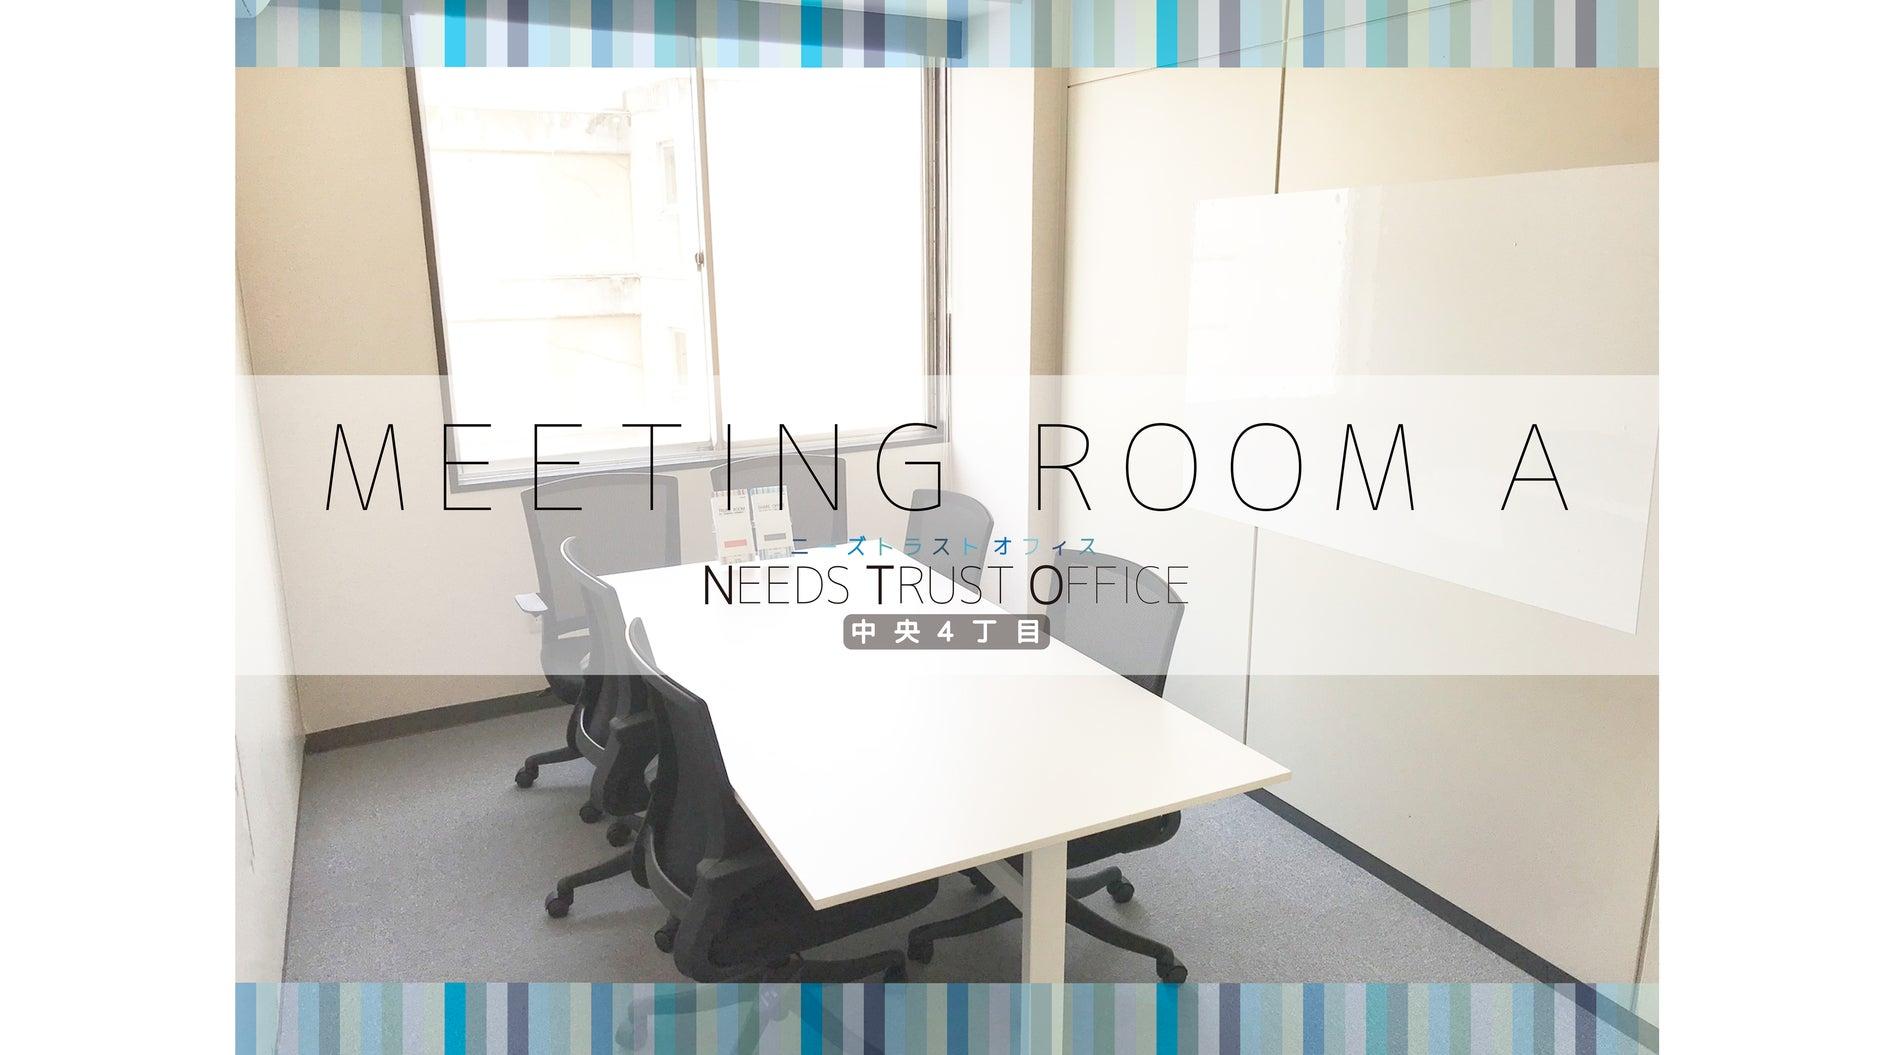 <NTO MEETING ROOM A>仙台駅西口より徒歩5分/シェアオフィス内の会議室 のサムネイル